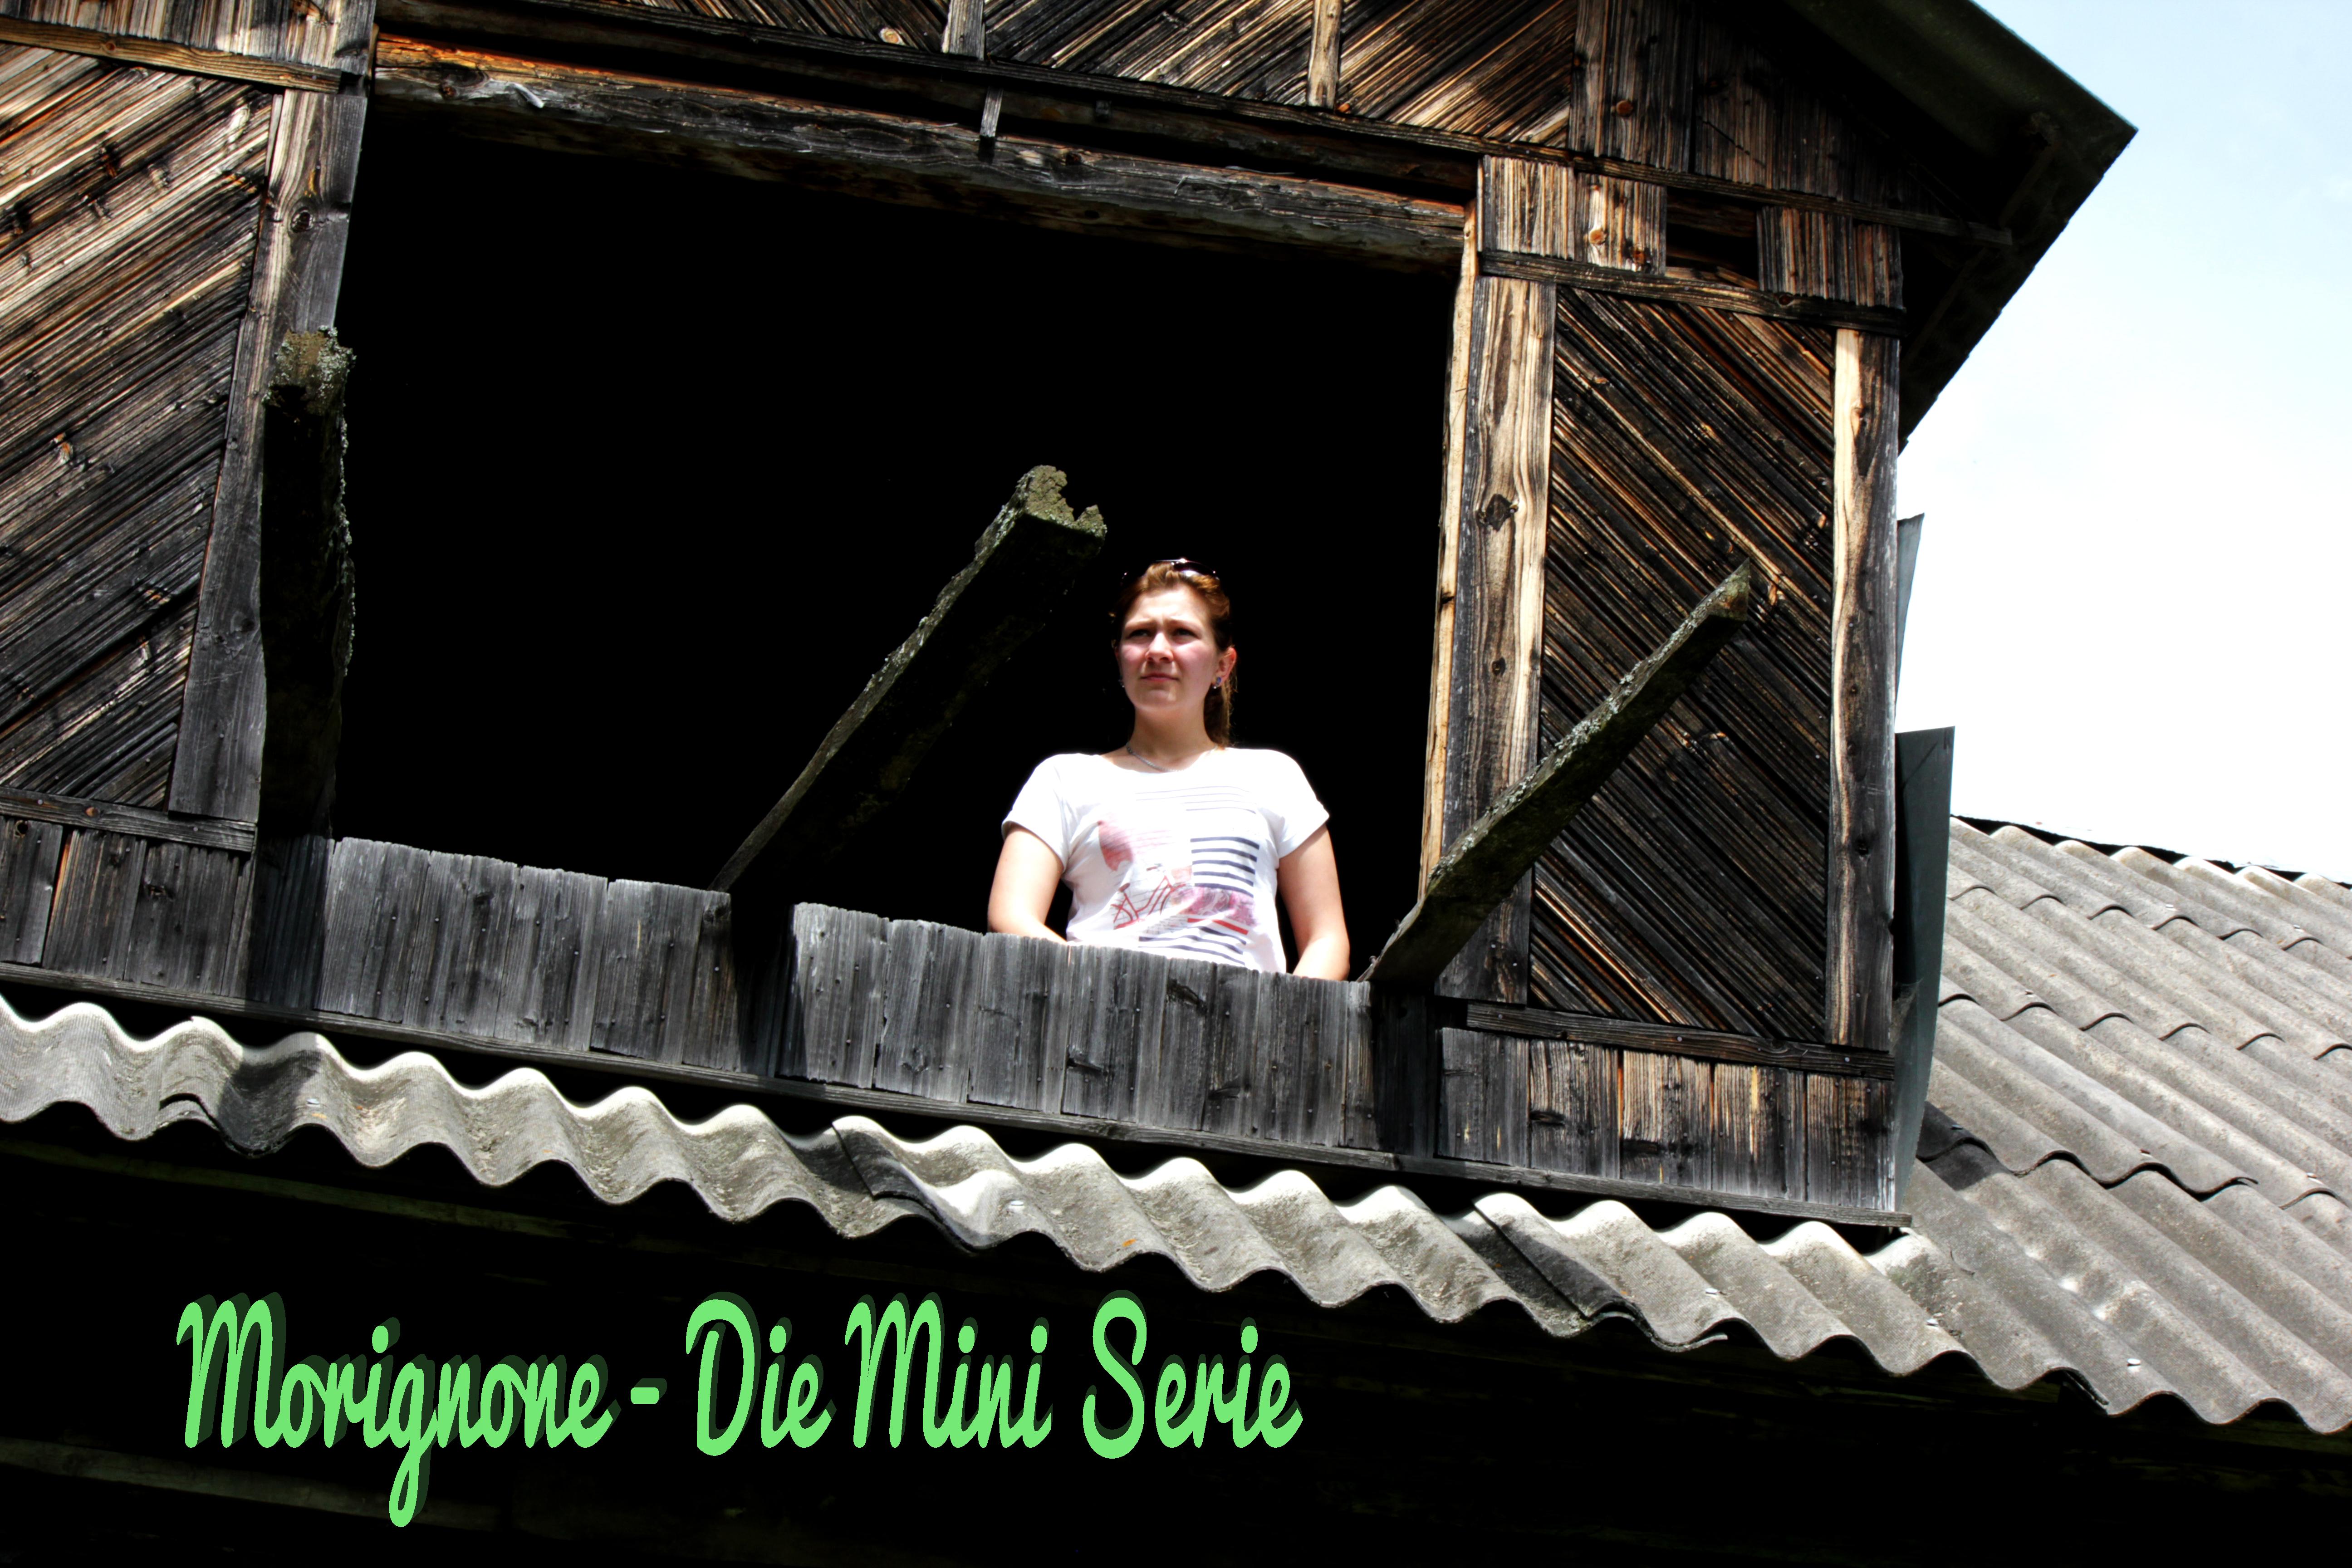 2. Morignone Drehtag